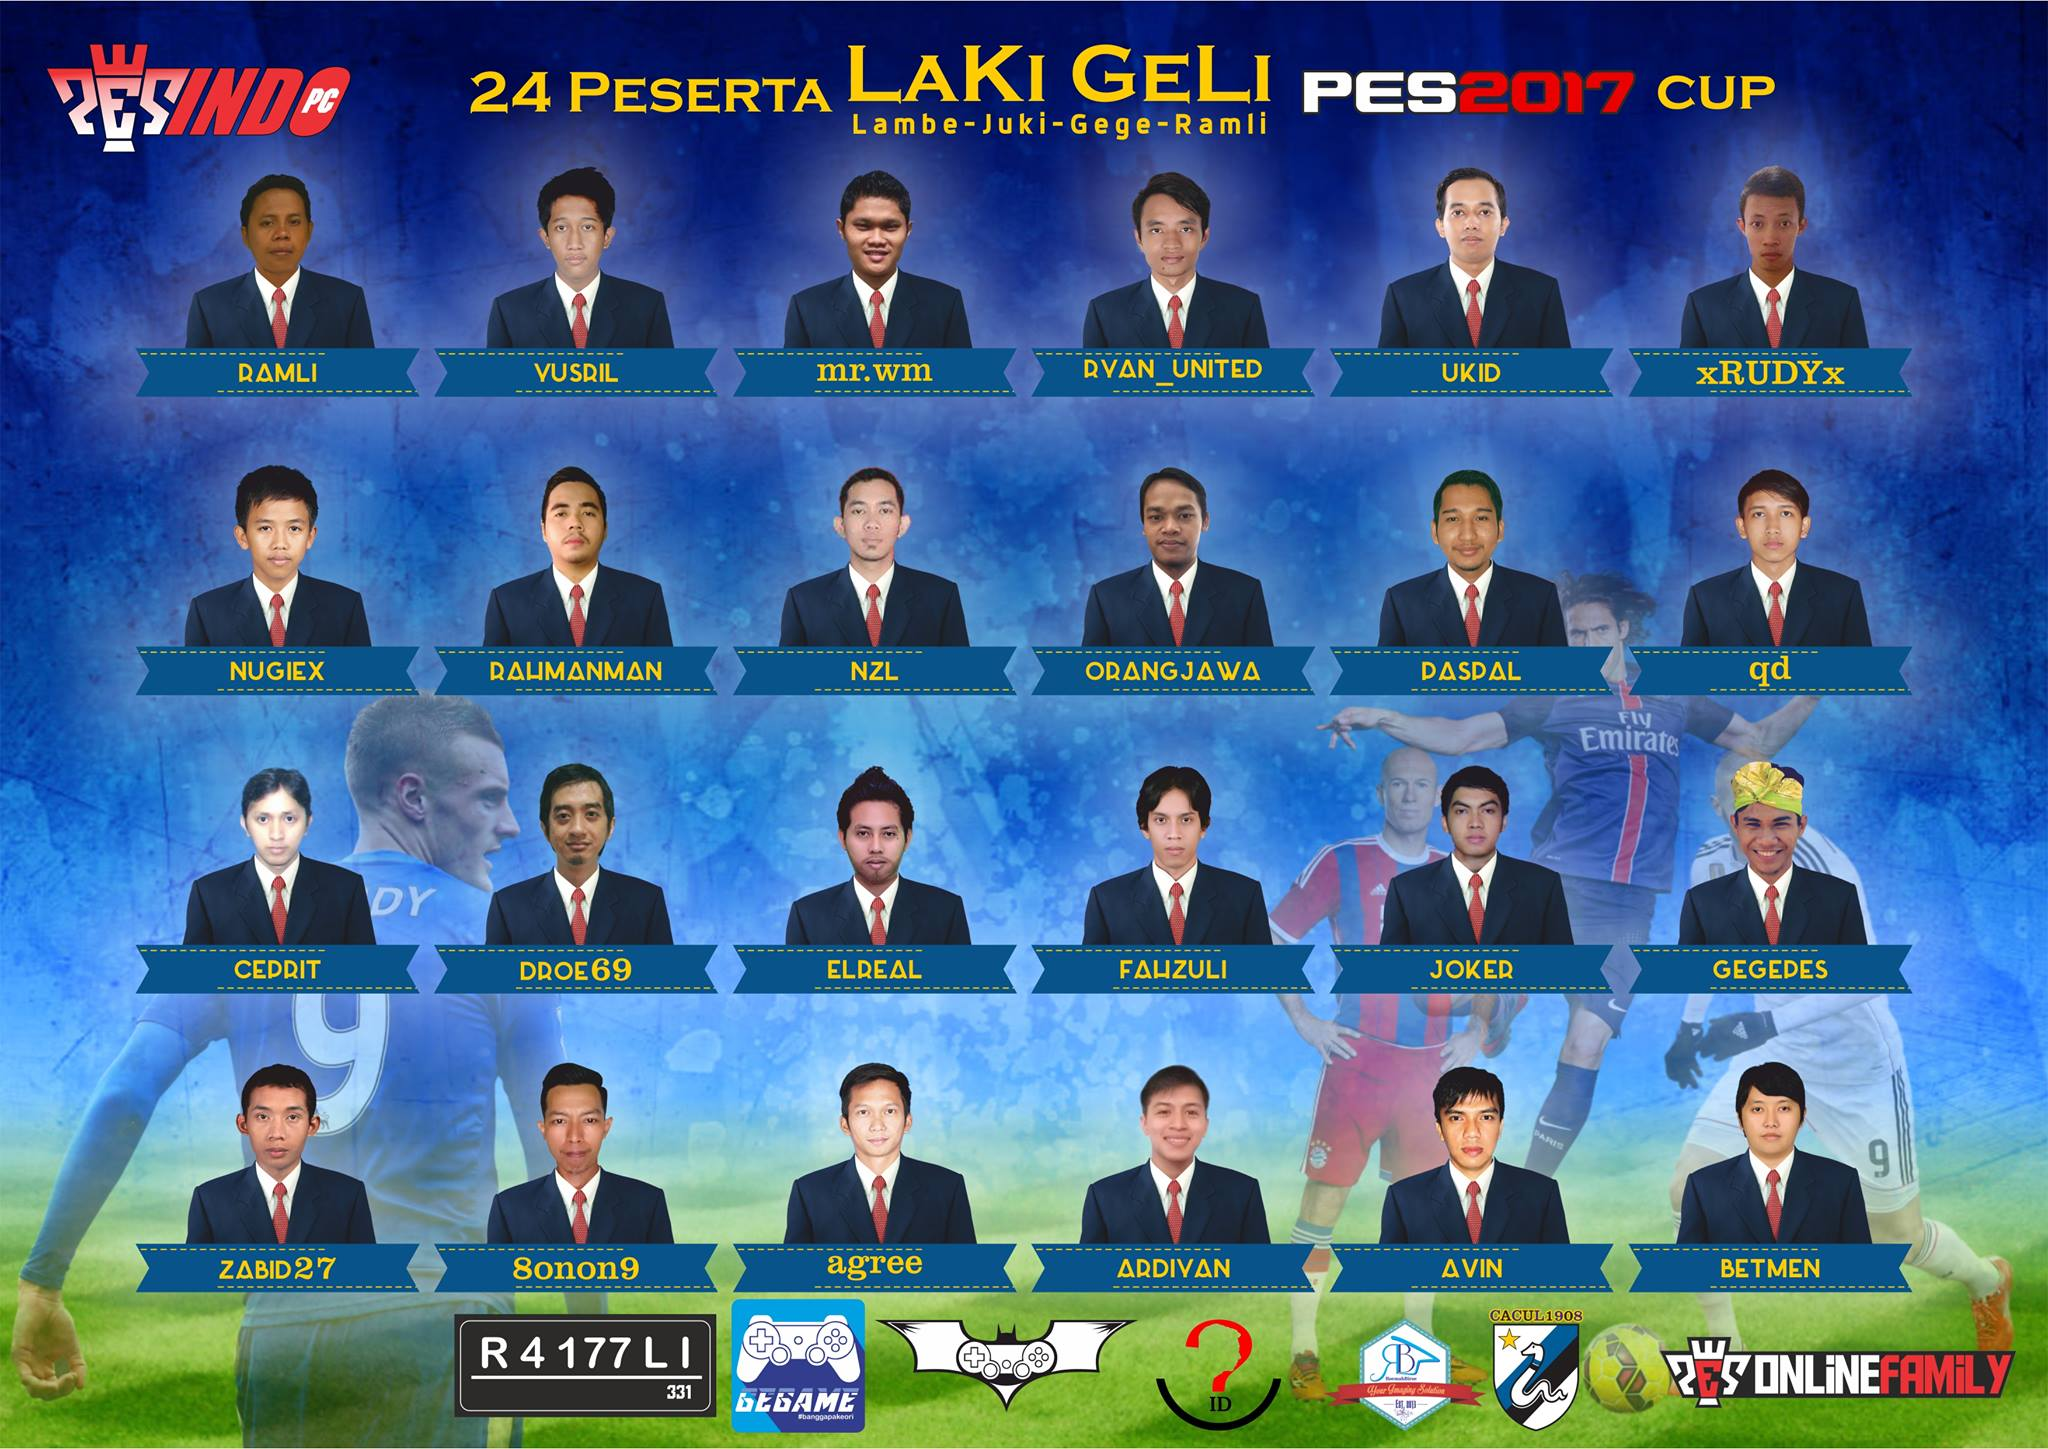 24-peserta-laki-geli-cup-edited-2